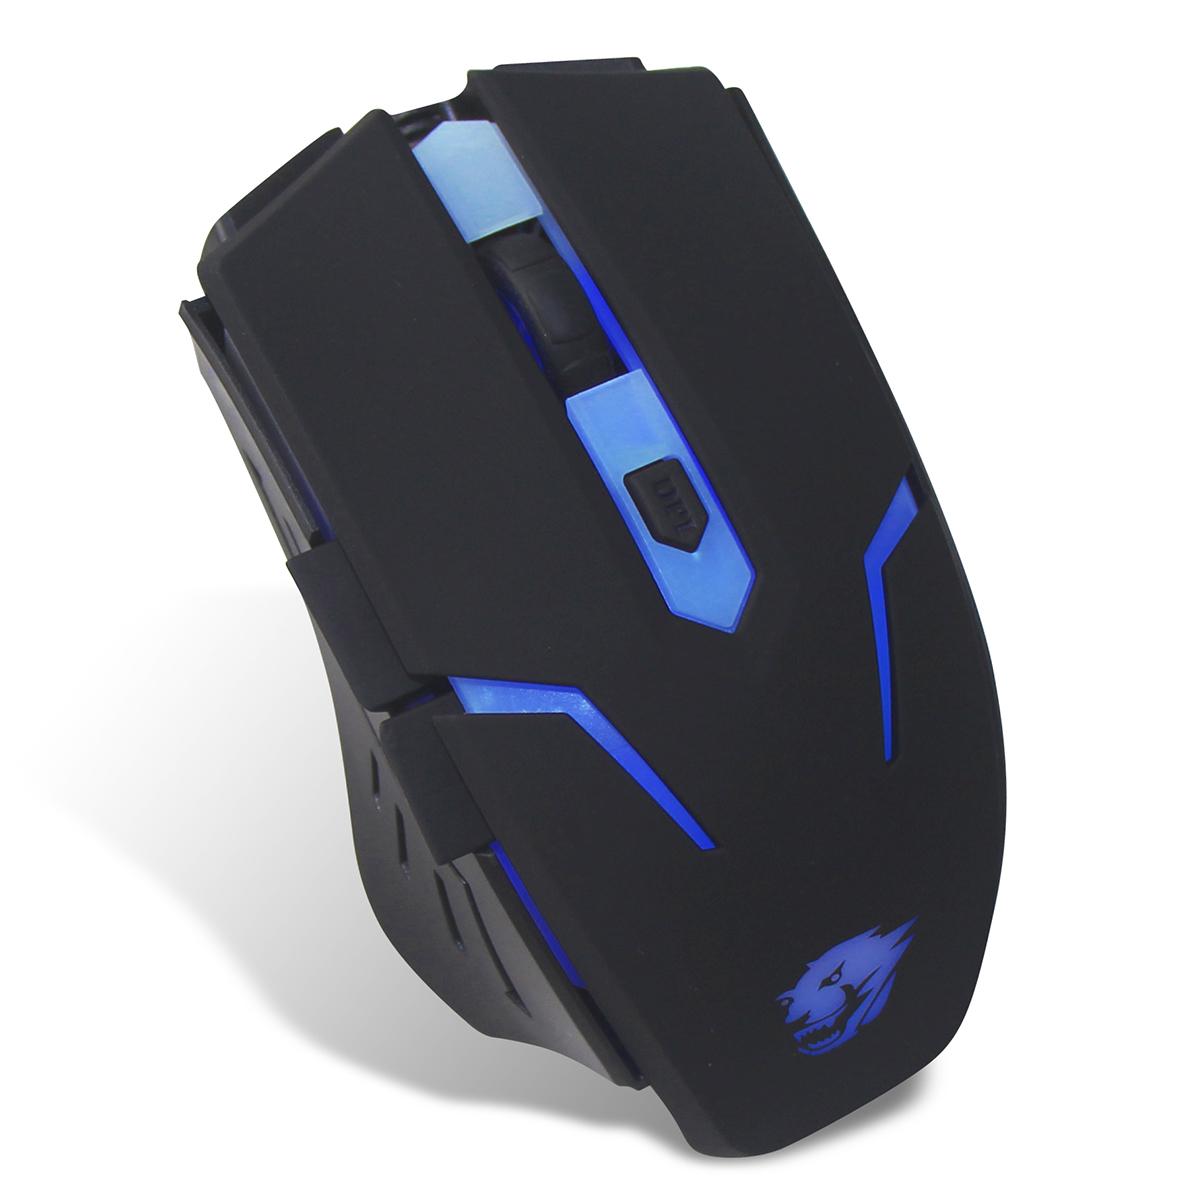 Powercool GM001 USB 2400DPI Black Right-hand mice